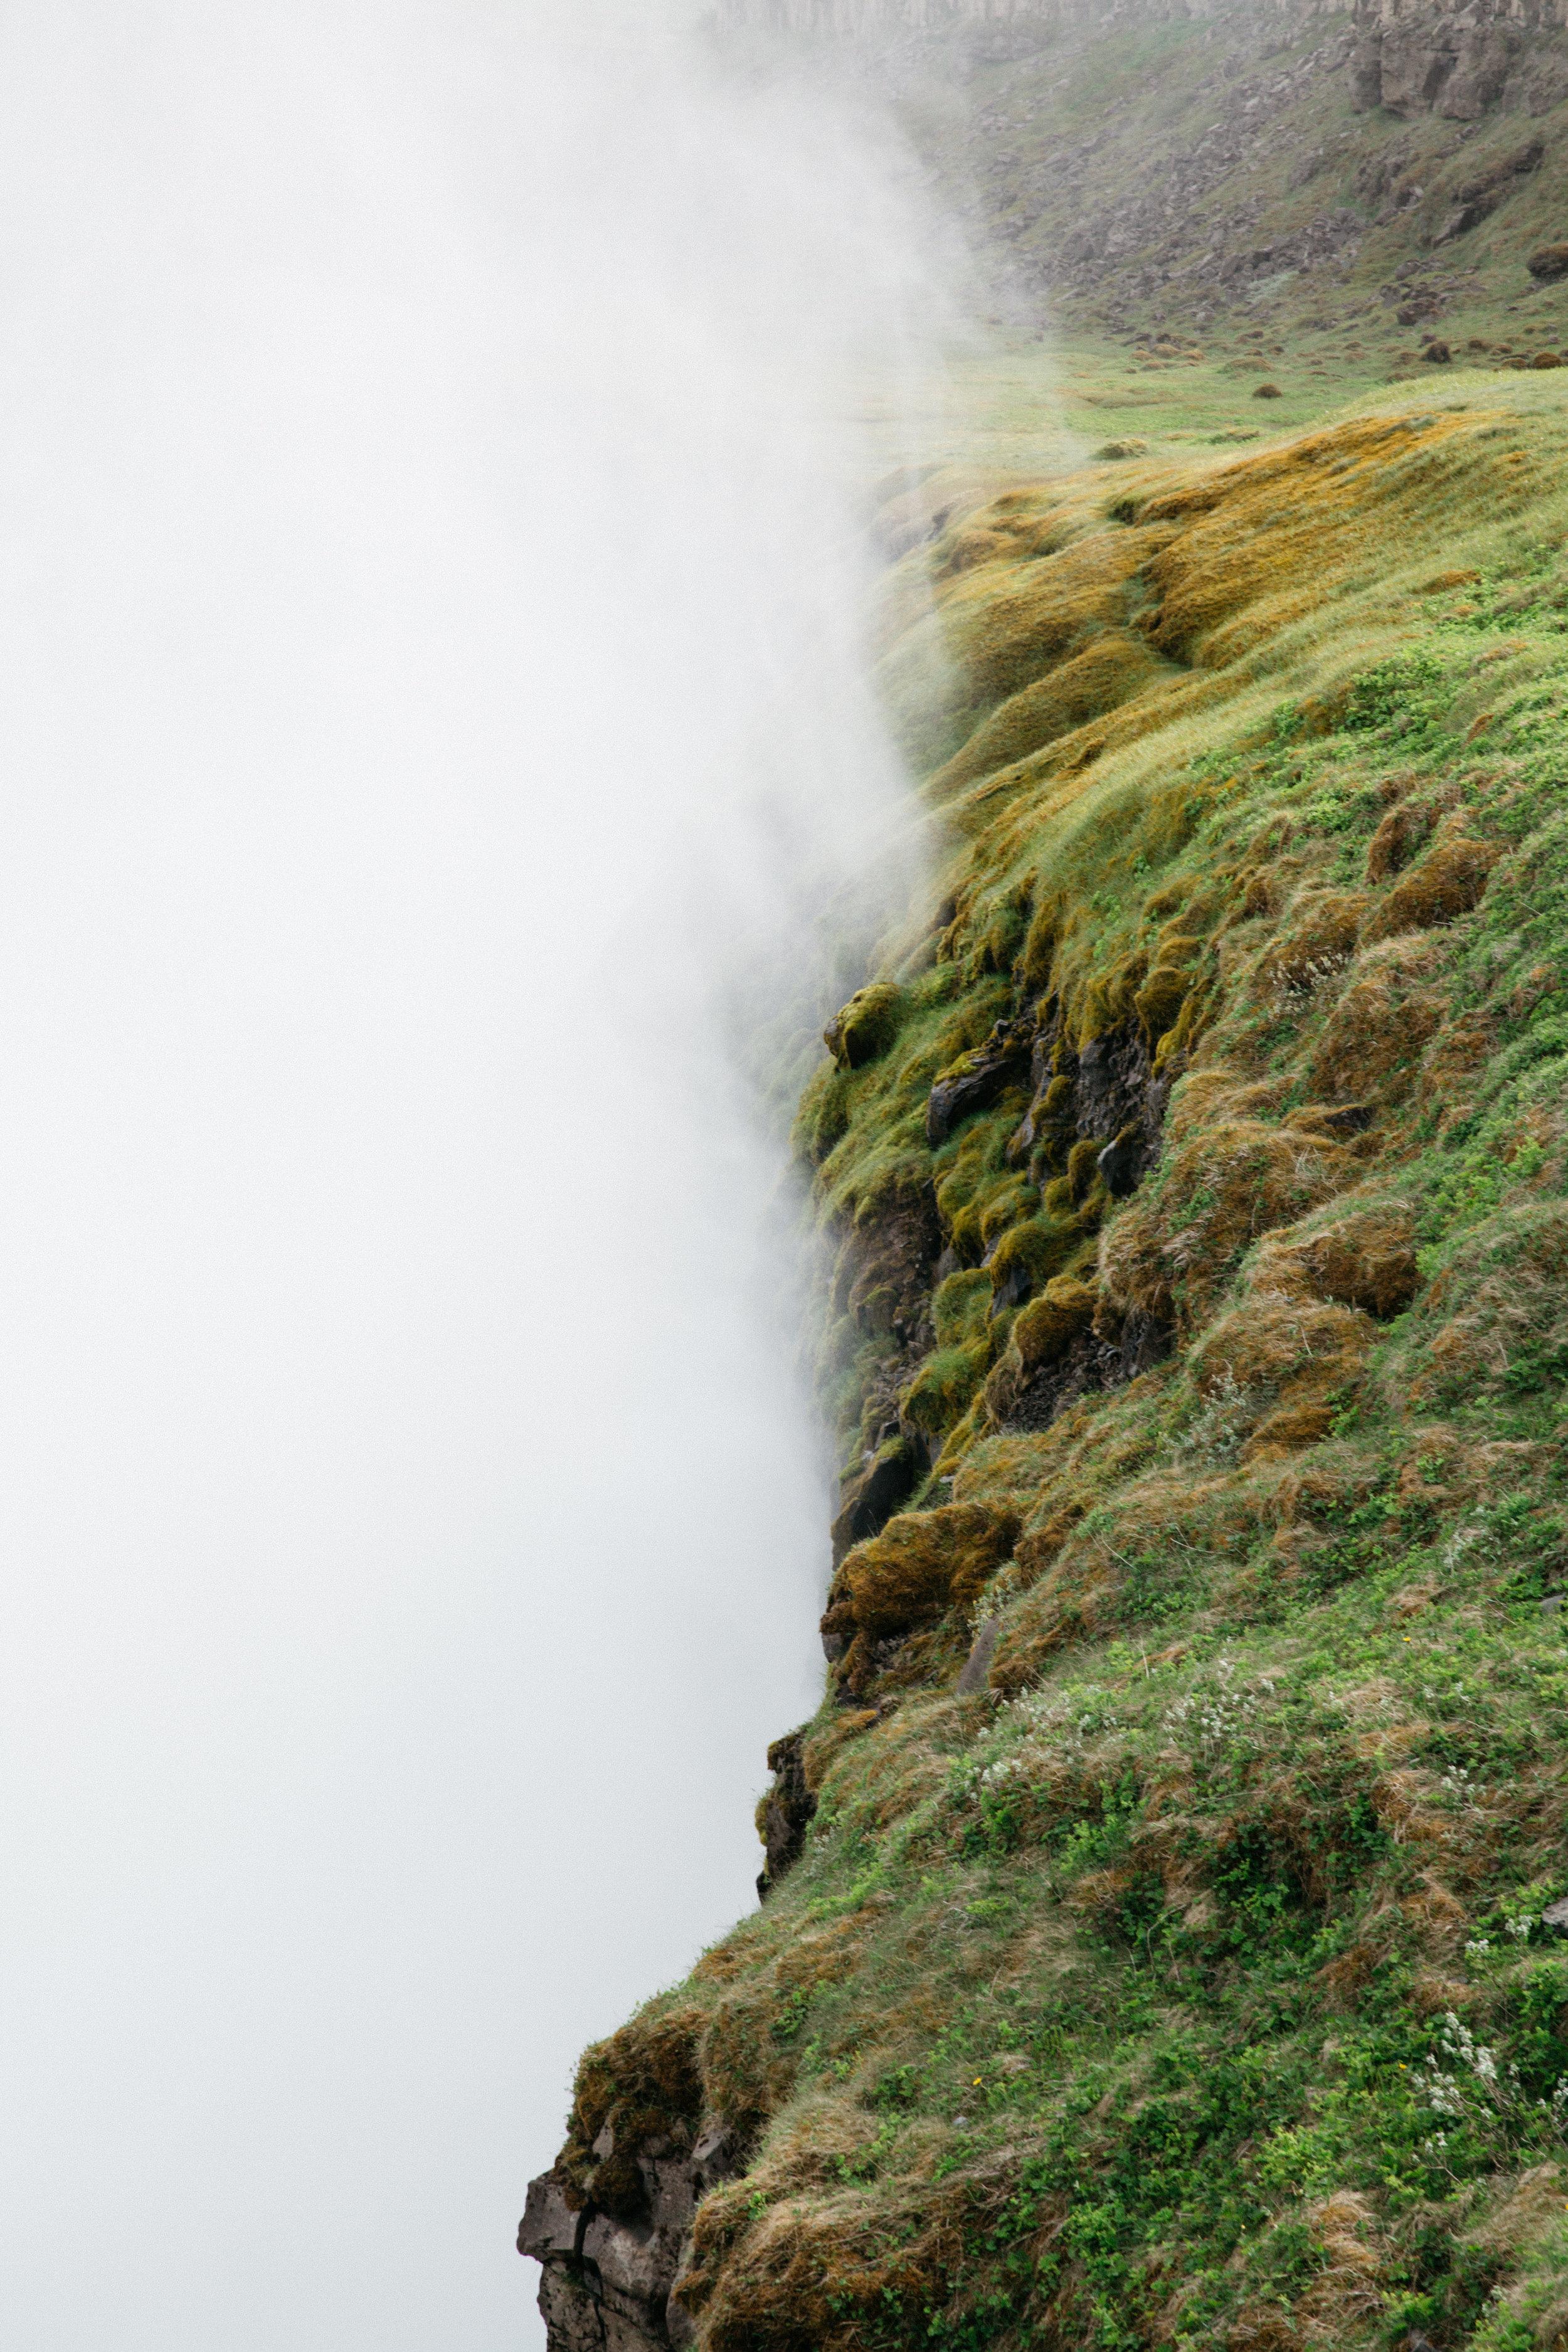 2017.06.14-23 Iceland00165.JPG